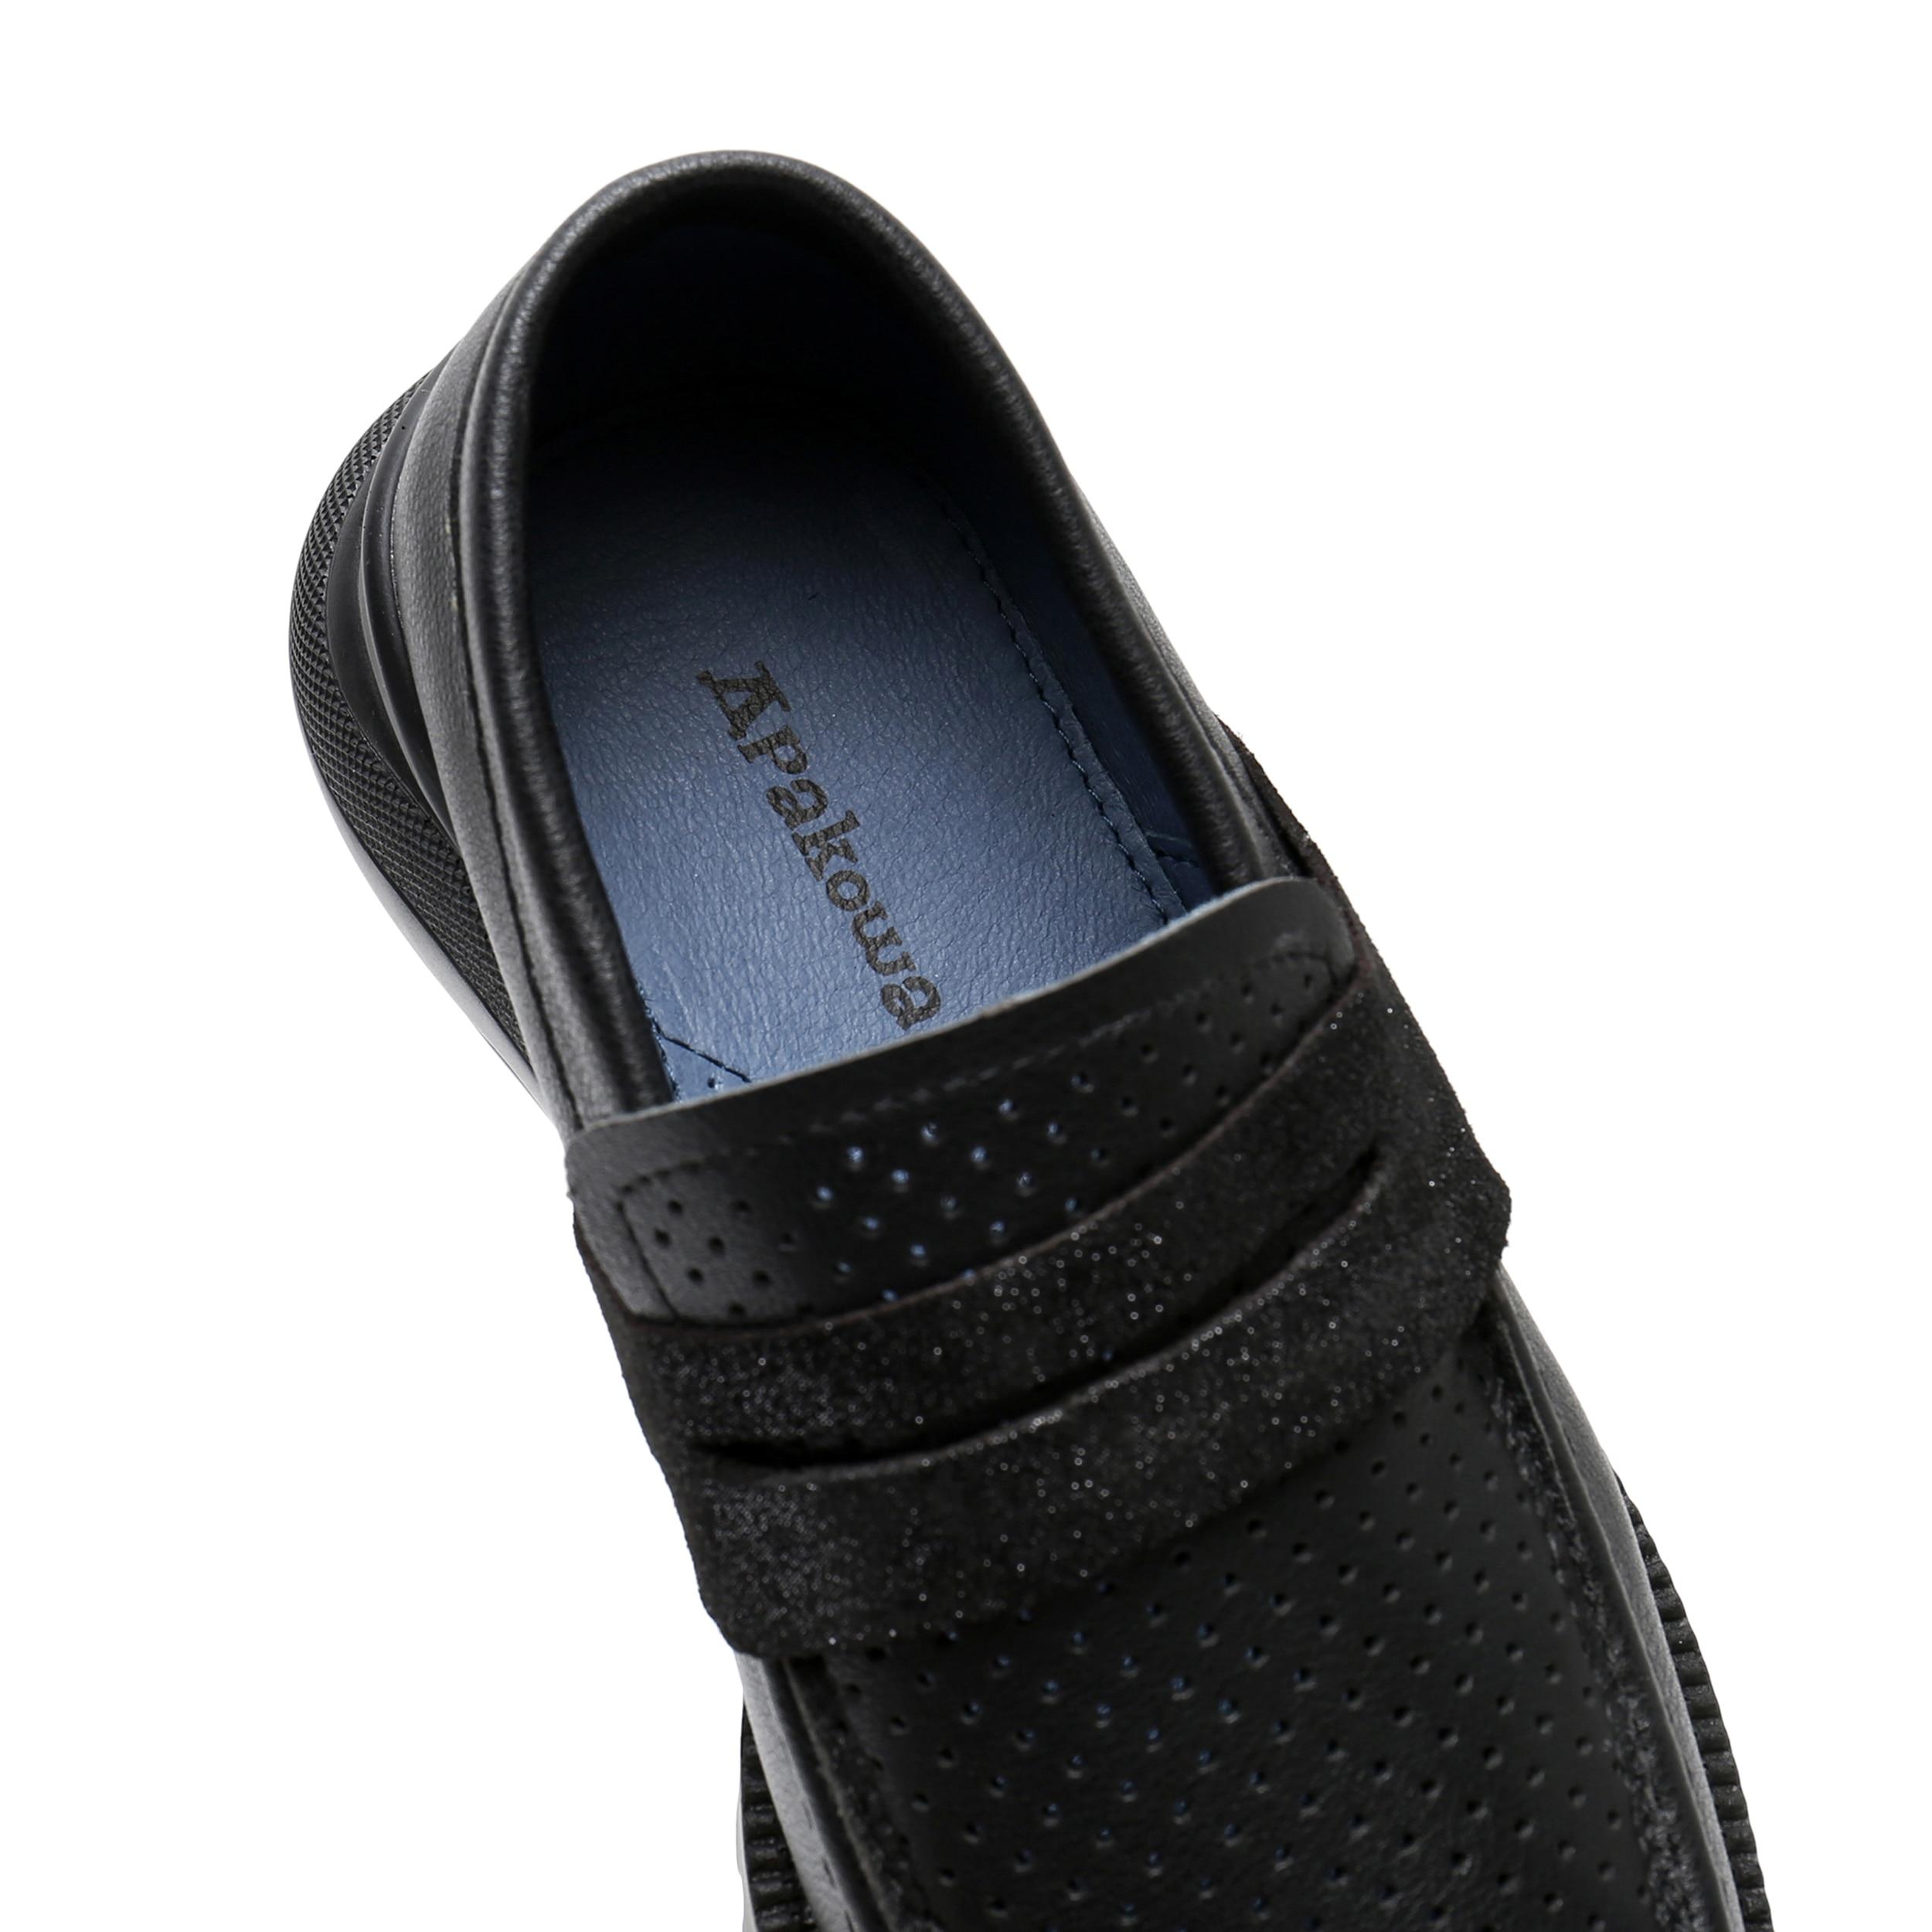 Apakowa meninos sapatos de couro genuíno deslizamento